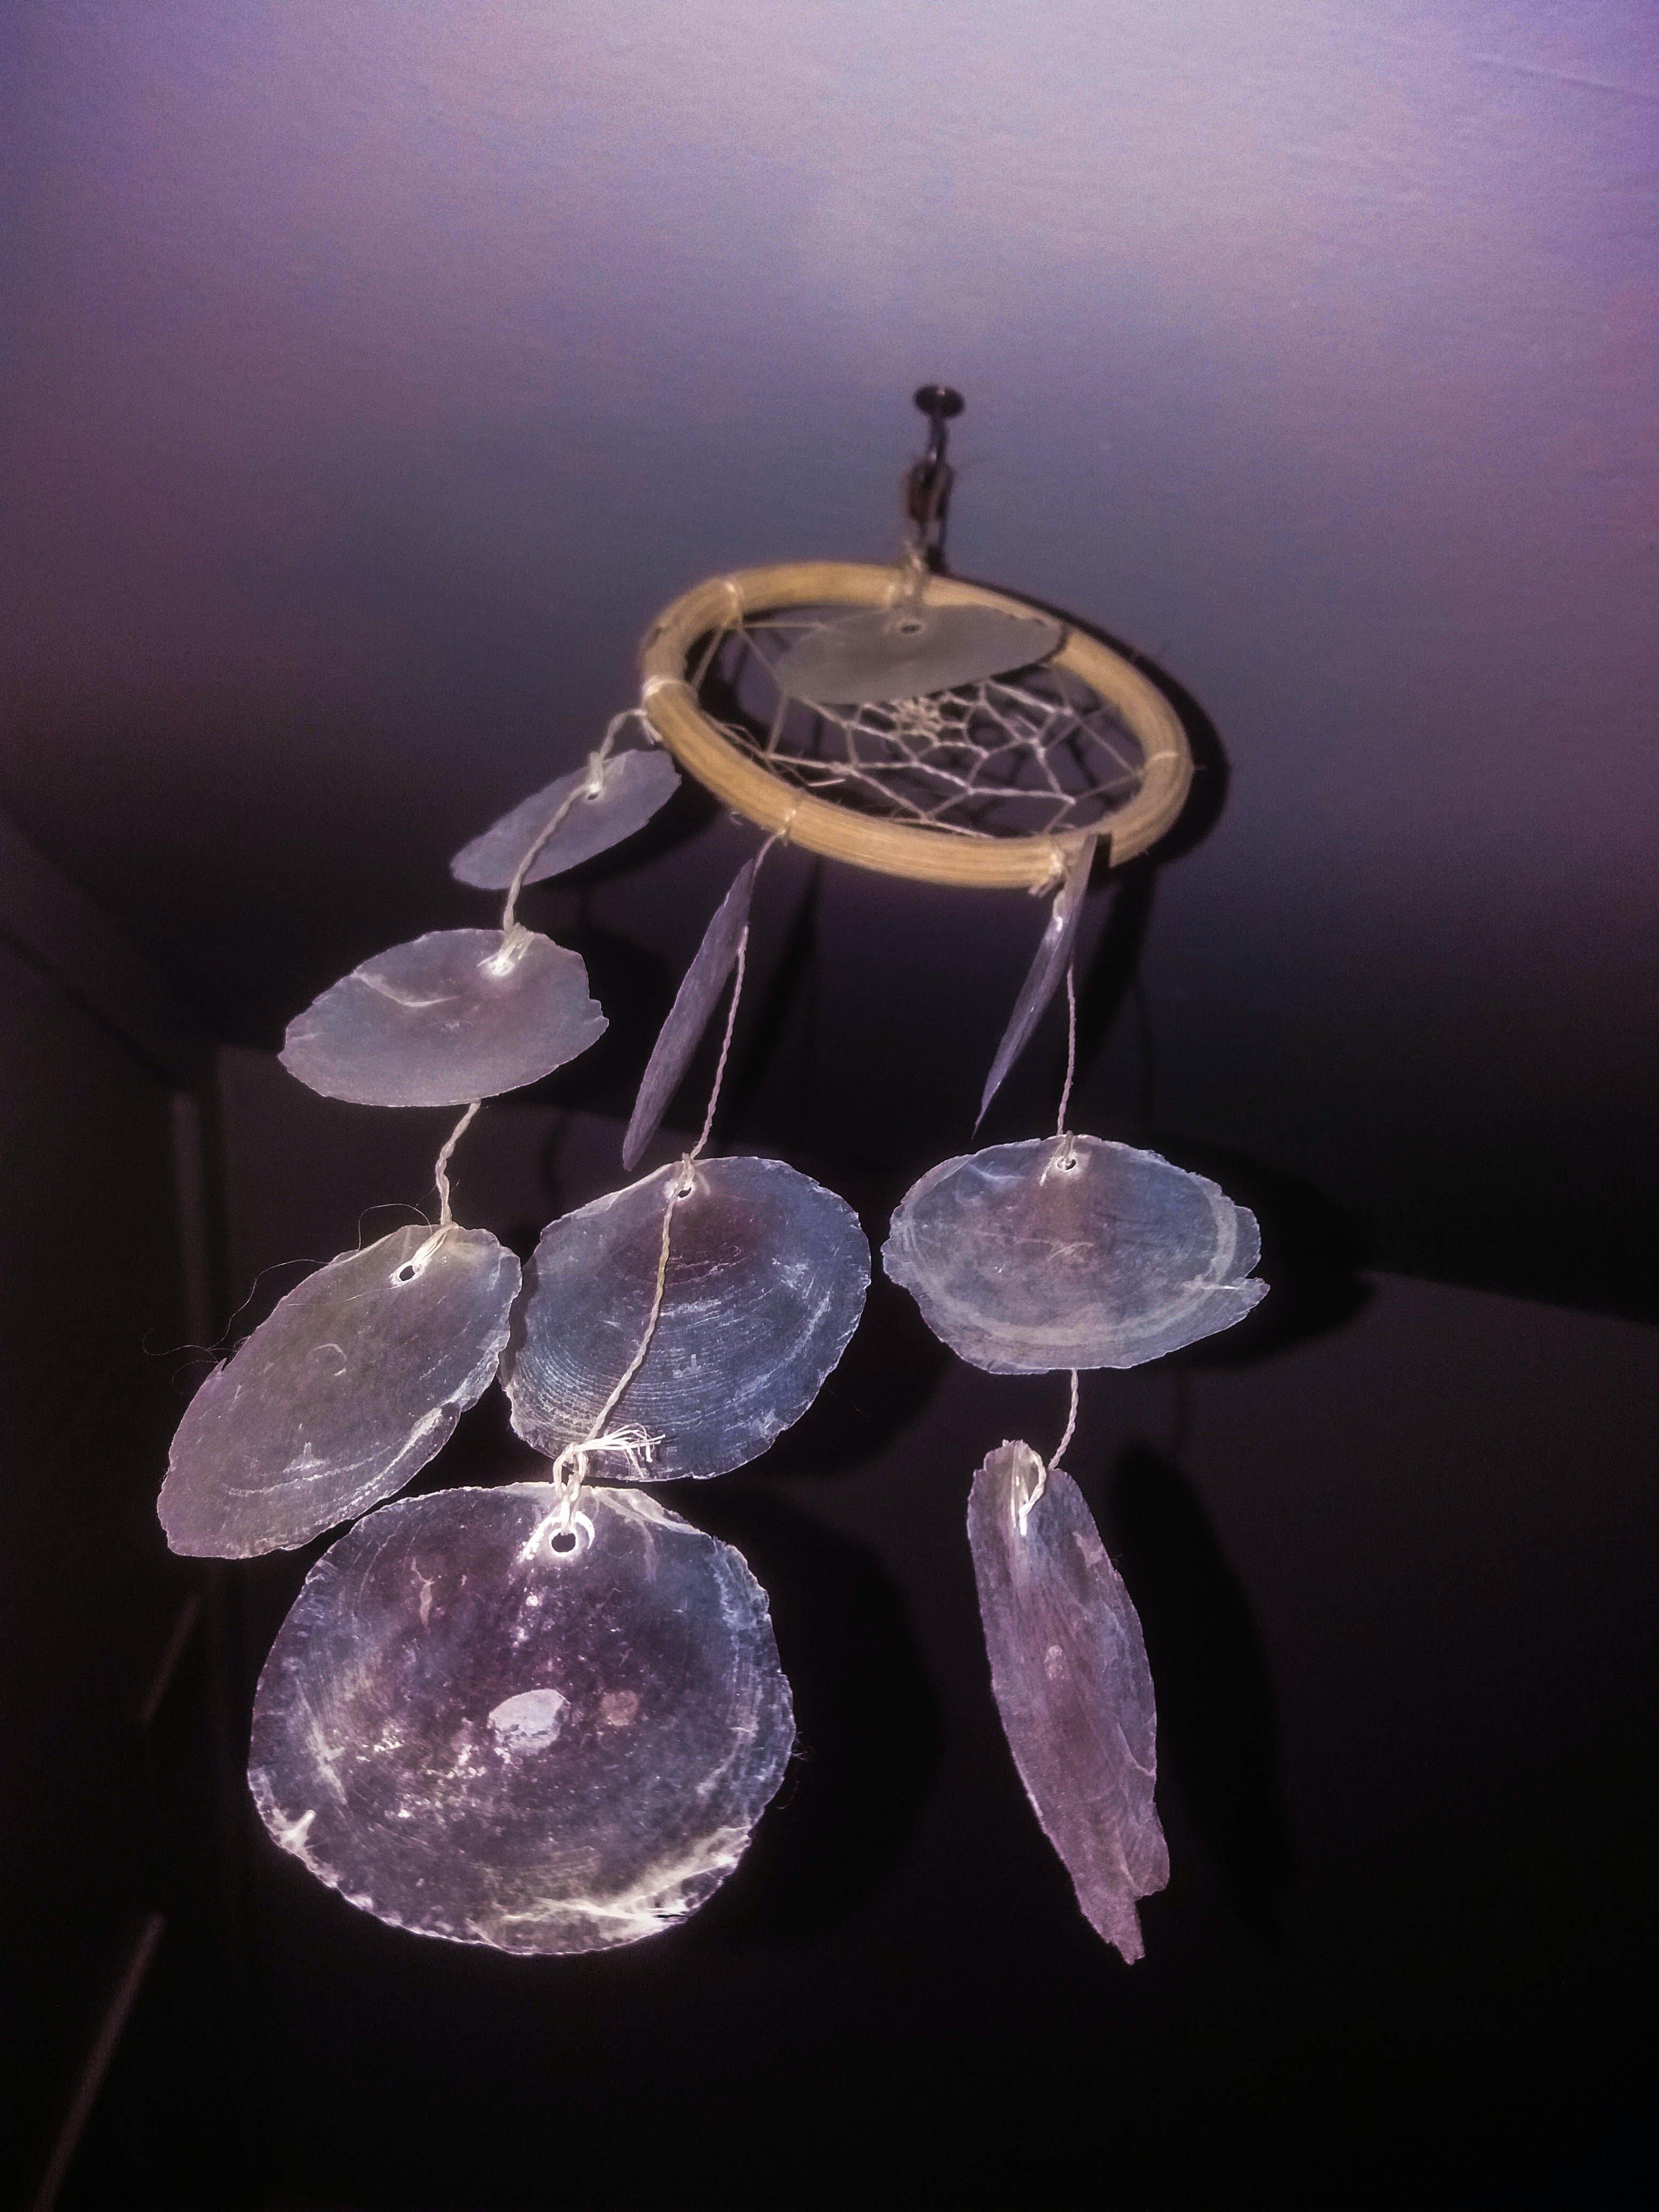 Free stock photo of #purple, #galaxy, #bedroom, #dream